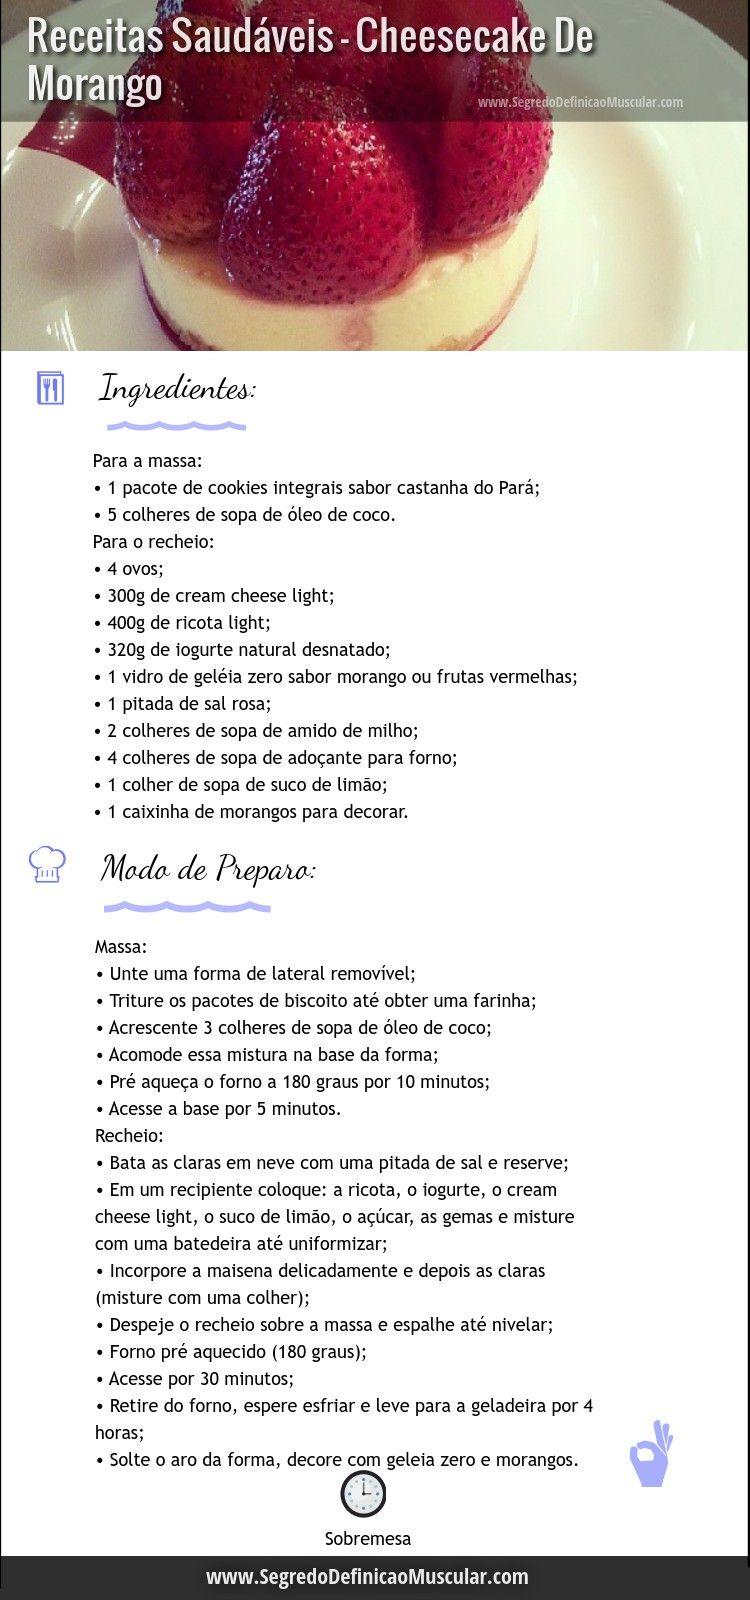 Receitas Saudável de Cheesecake De Morango